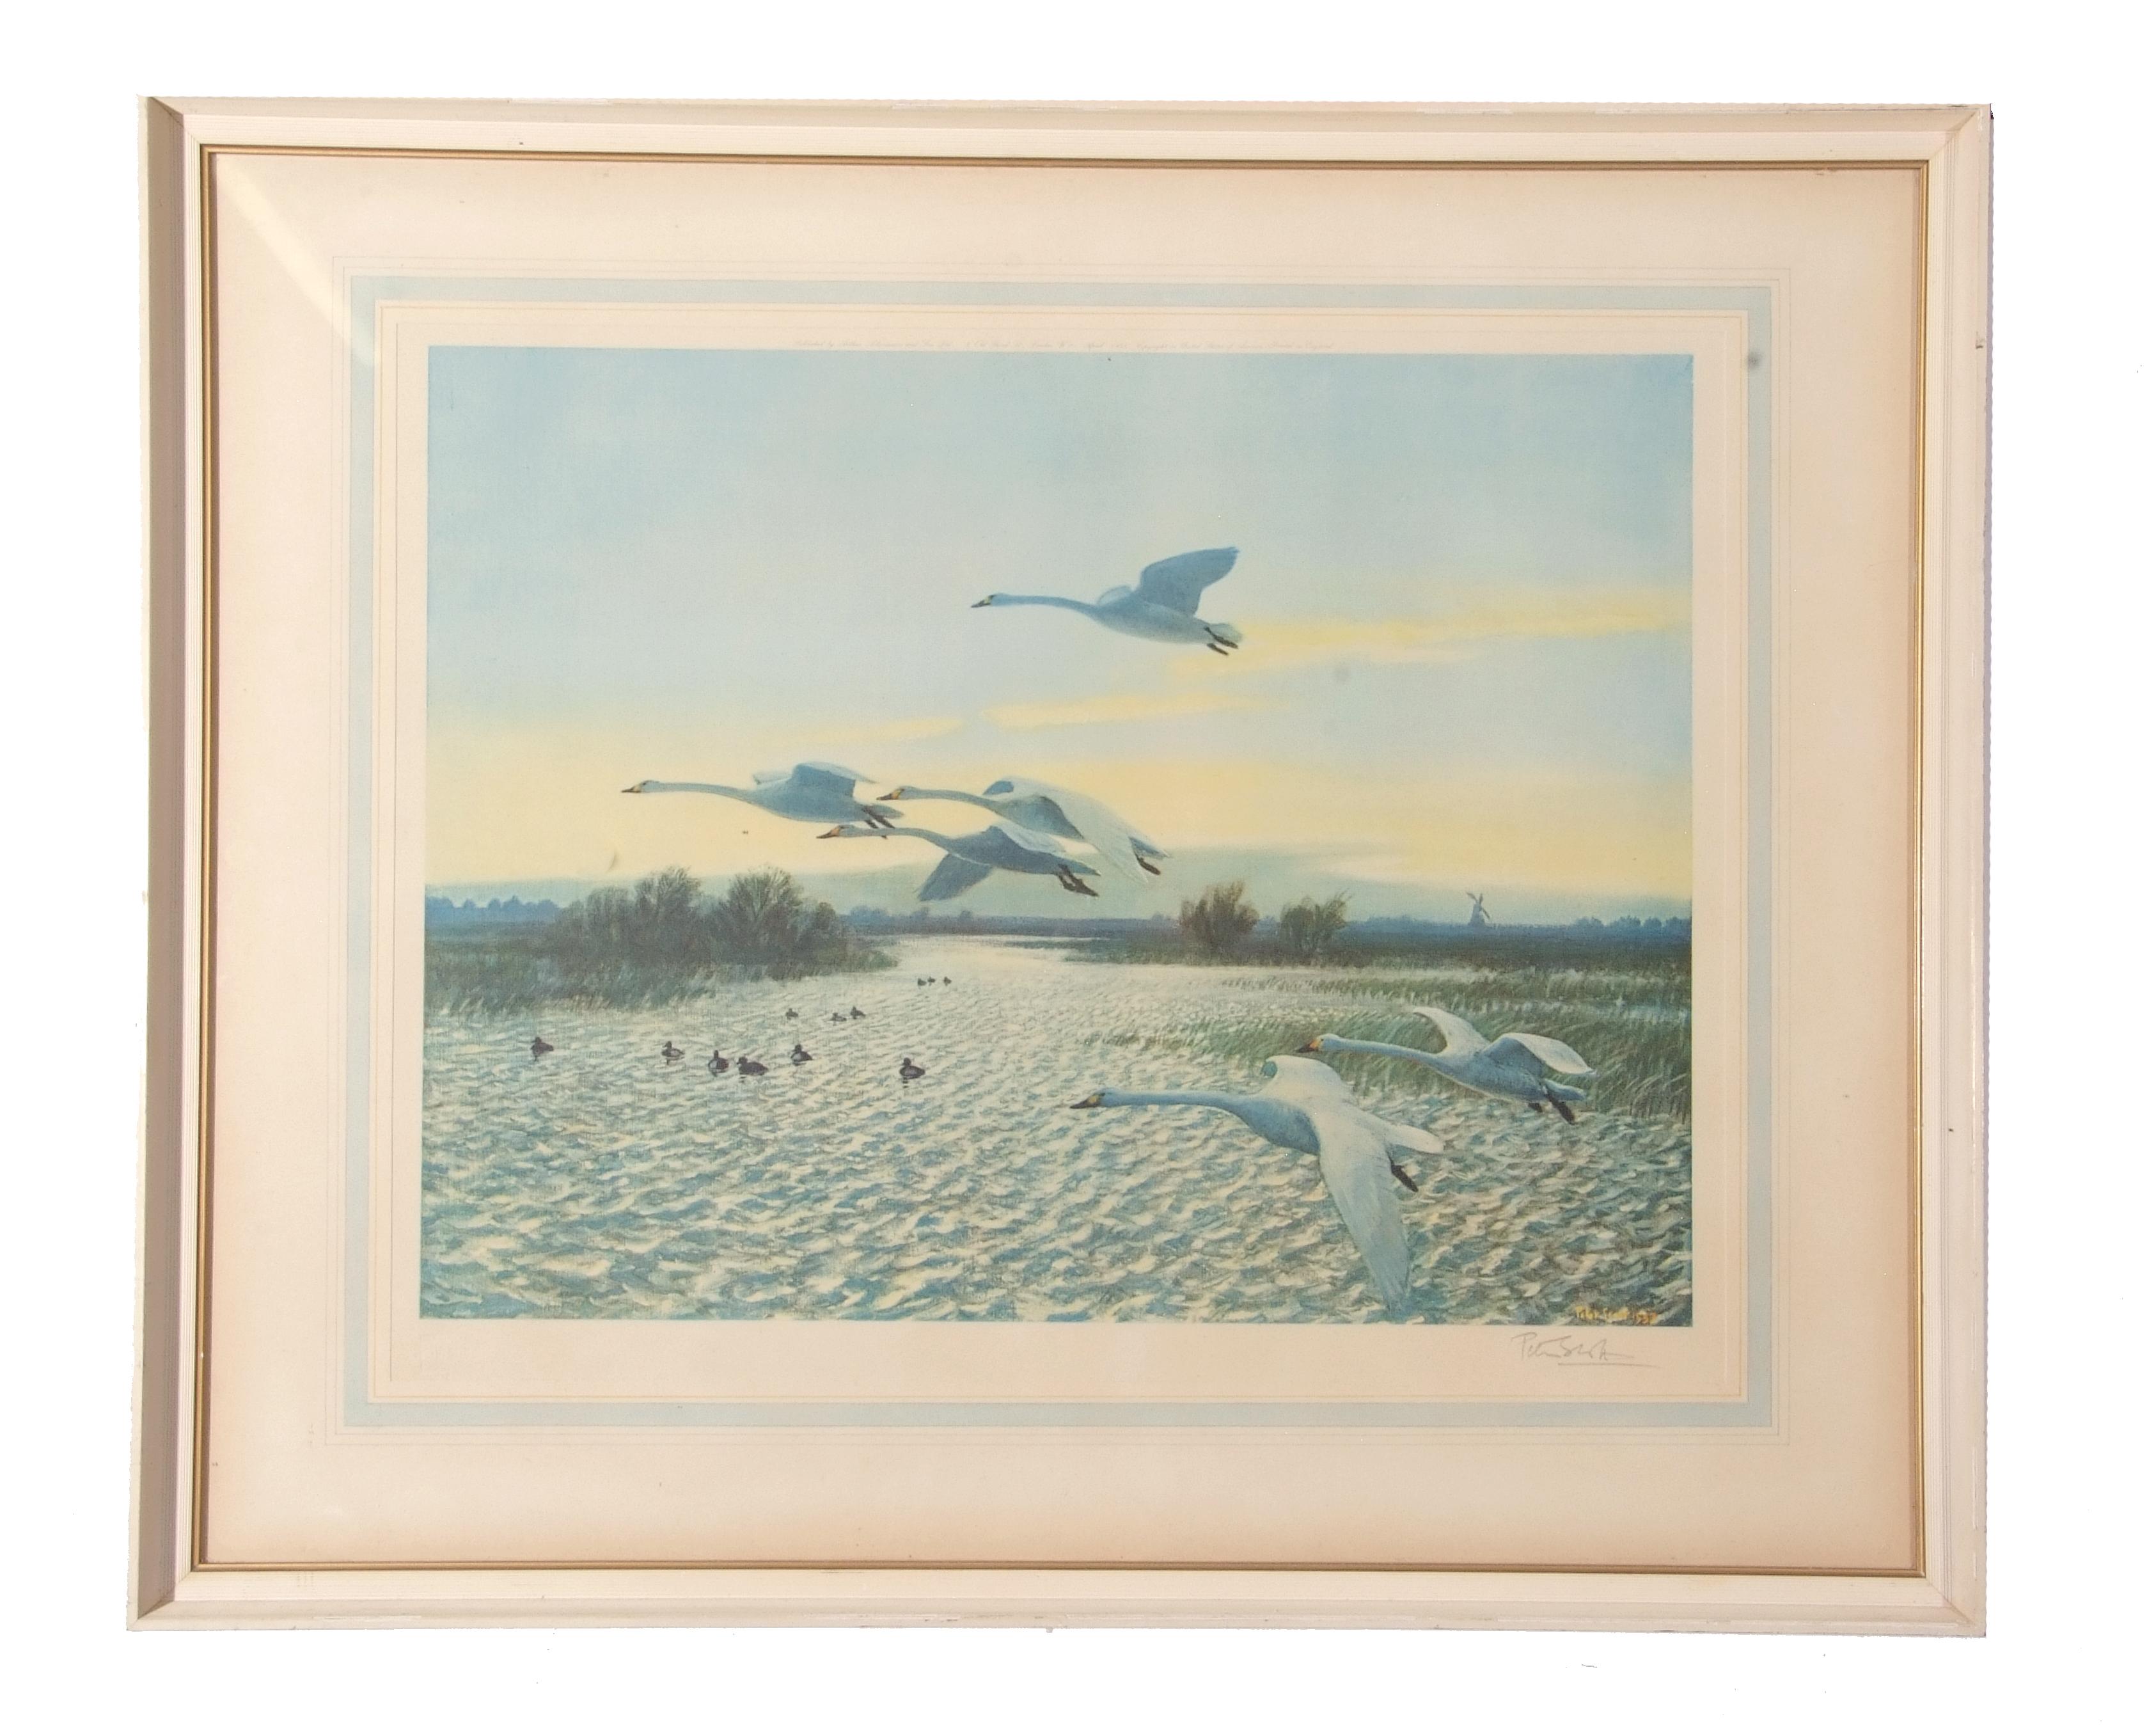 Peter Markham Scott, print, signed inn pencil to margin, Swans in Flight, 44 x 52cm